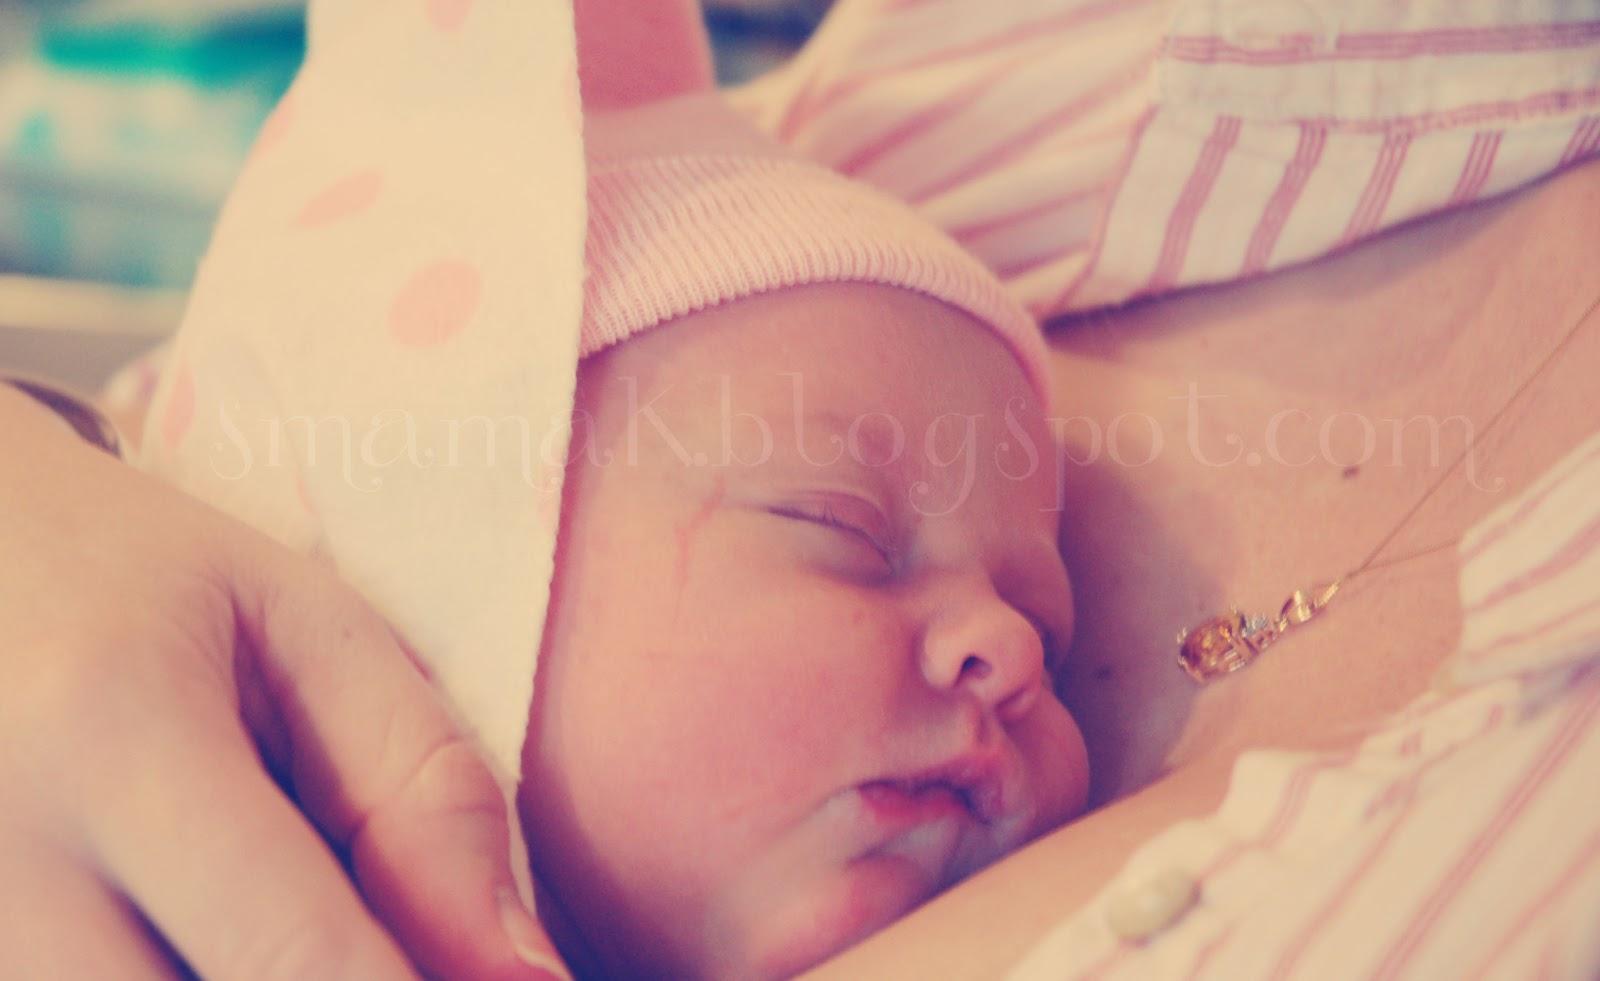 MG's Birth Story {the short version}